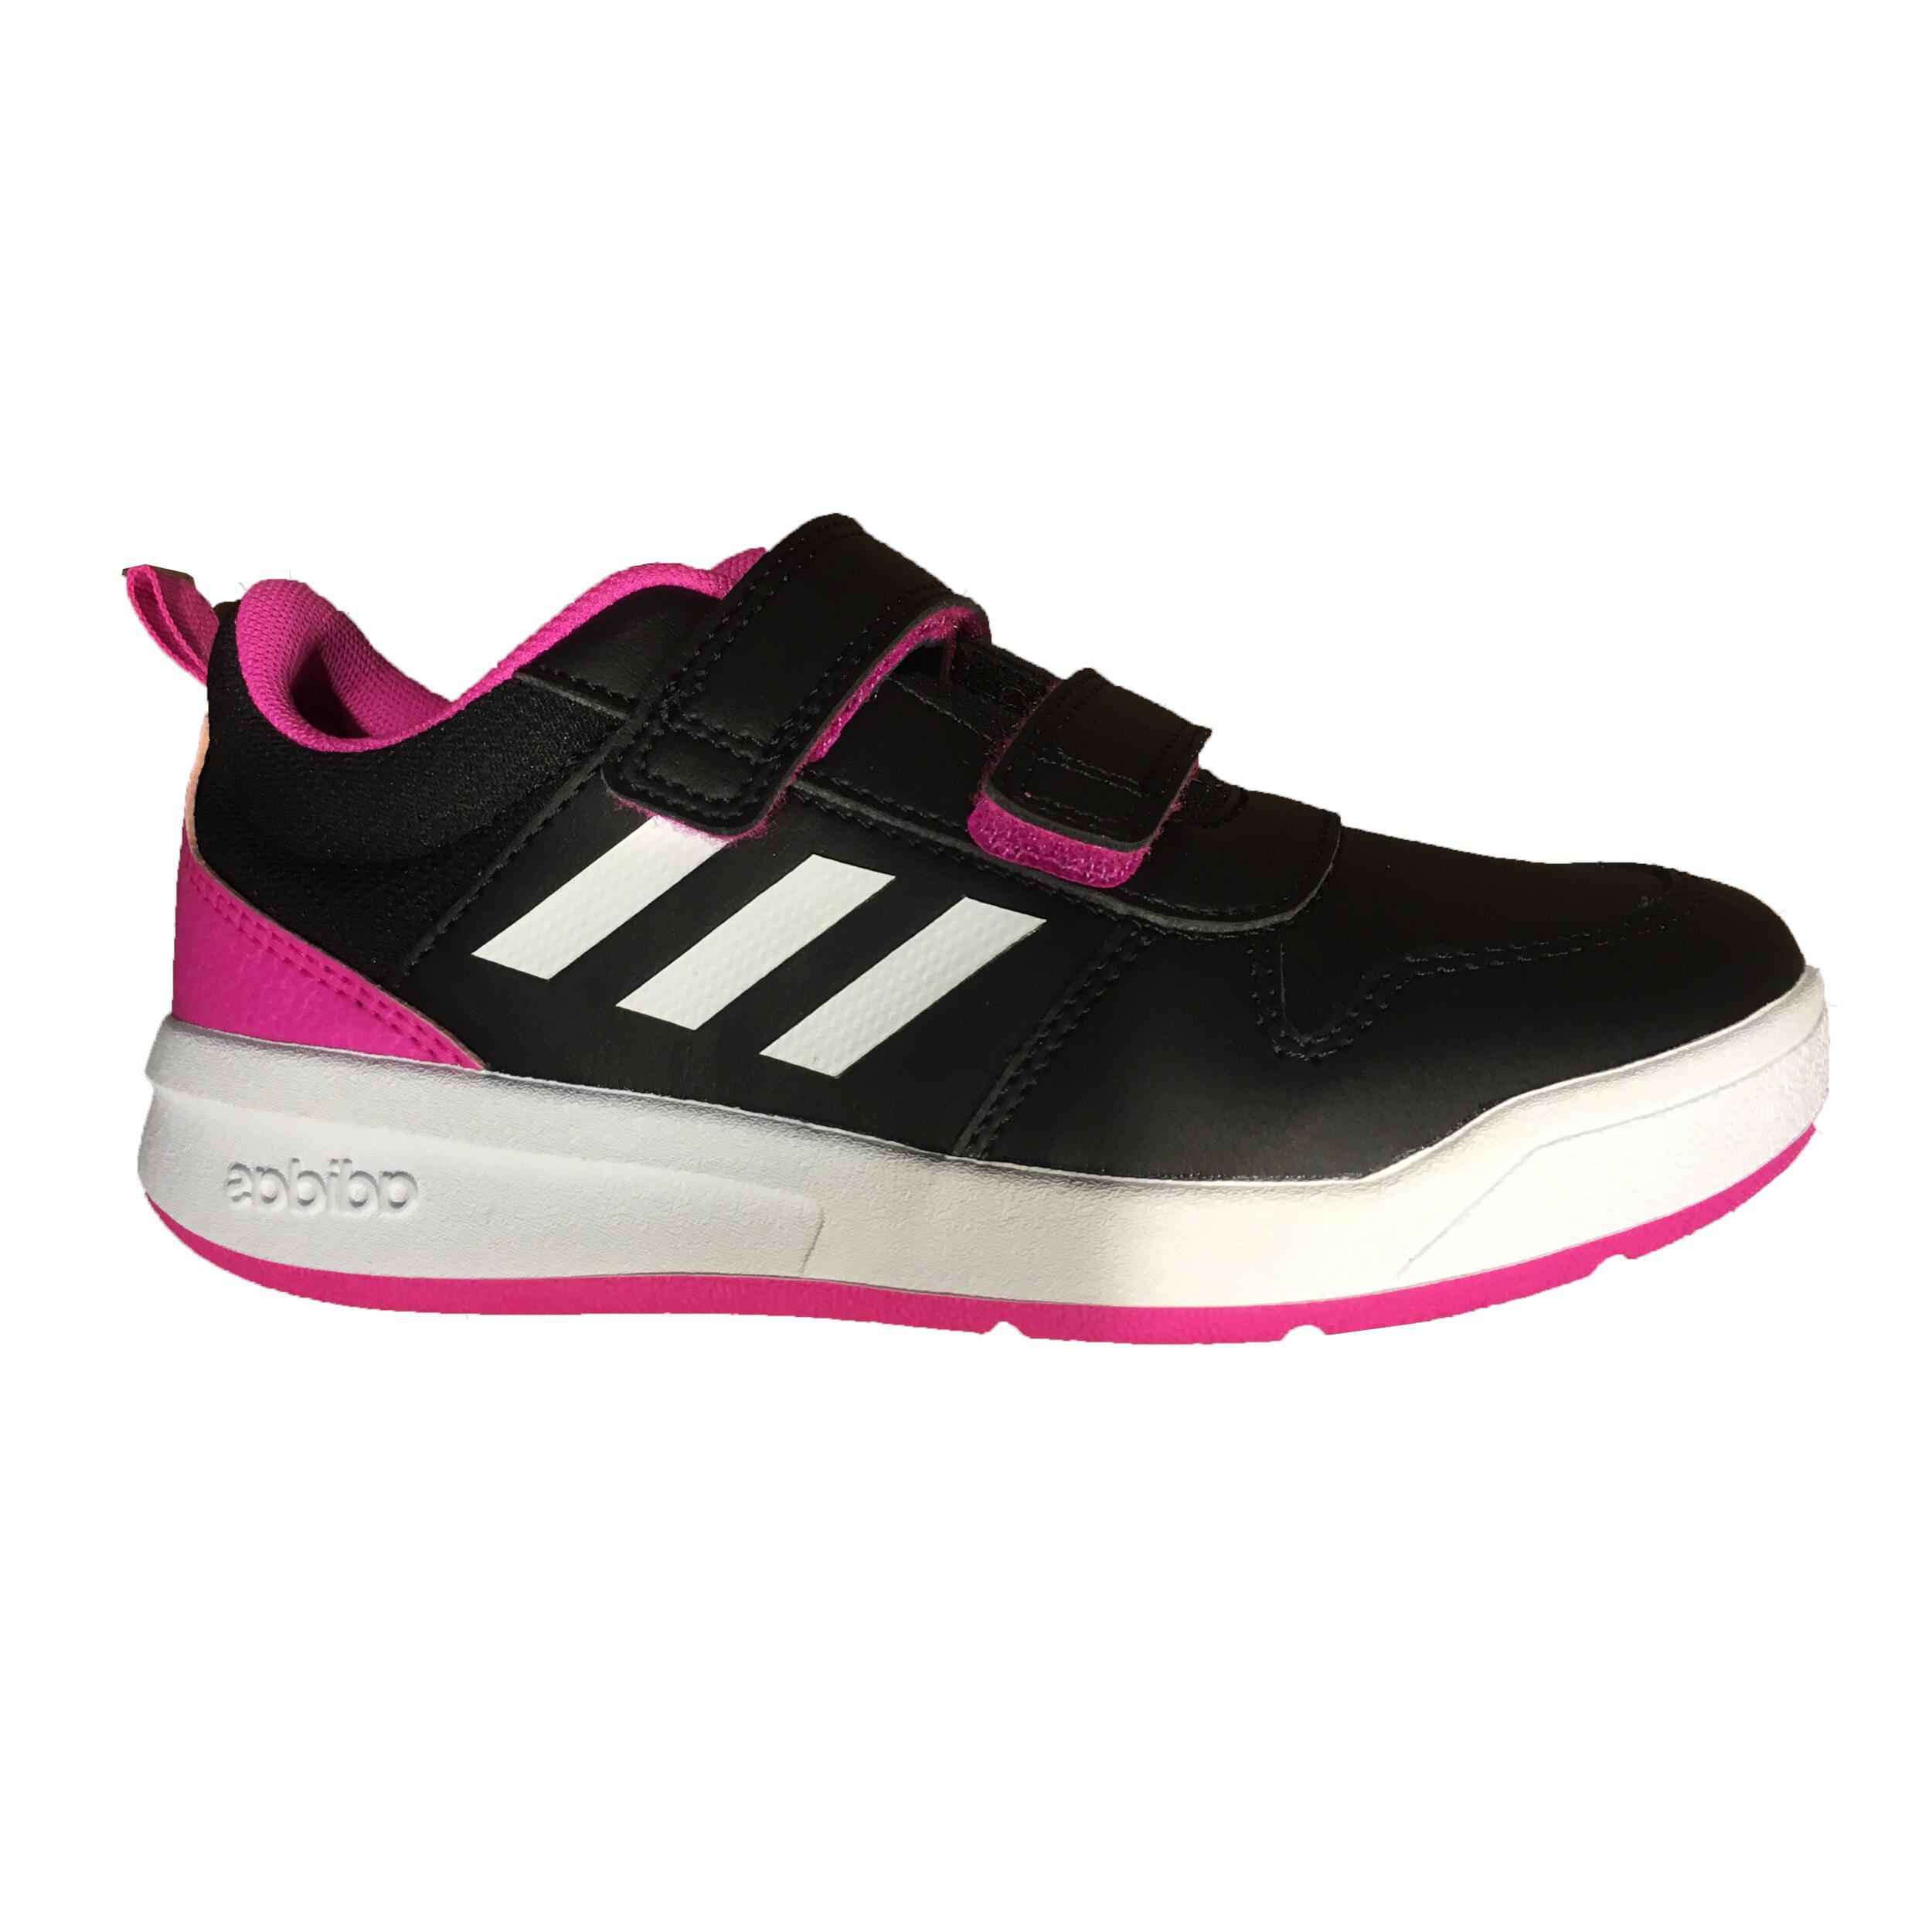 Adidas Cloudfoam Groove W Chaussures Femmes Chaussures De Course Sneaker tailles au choix NEUF